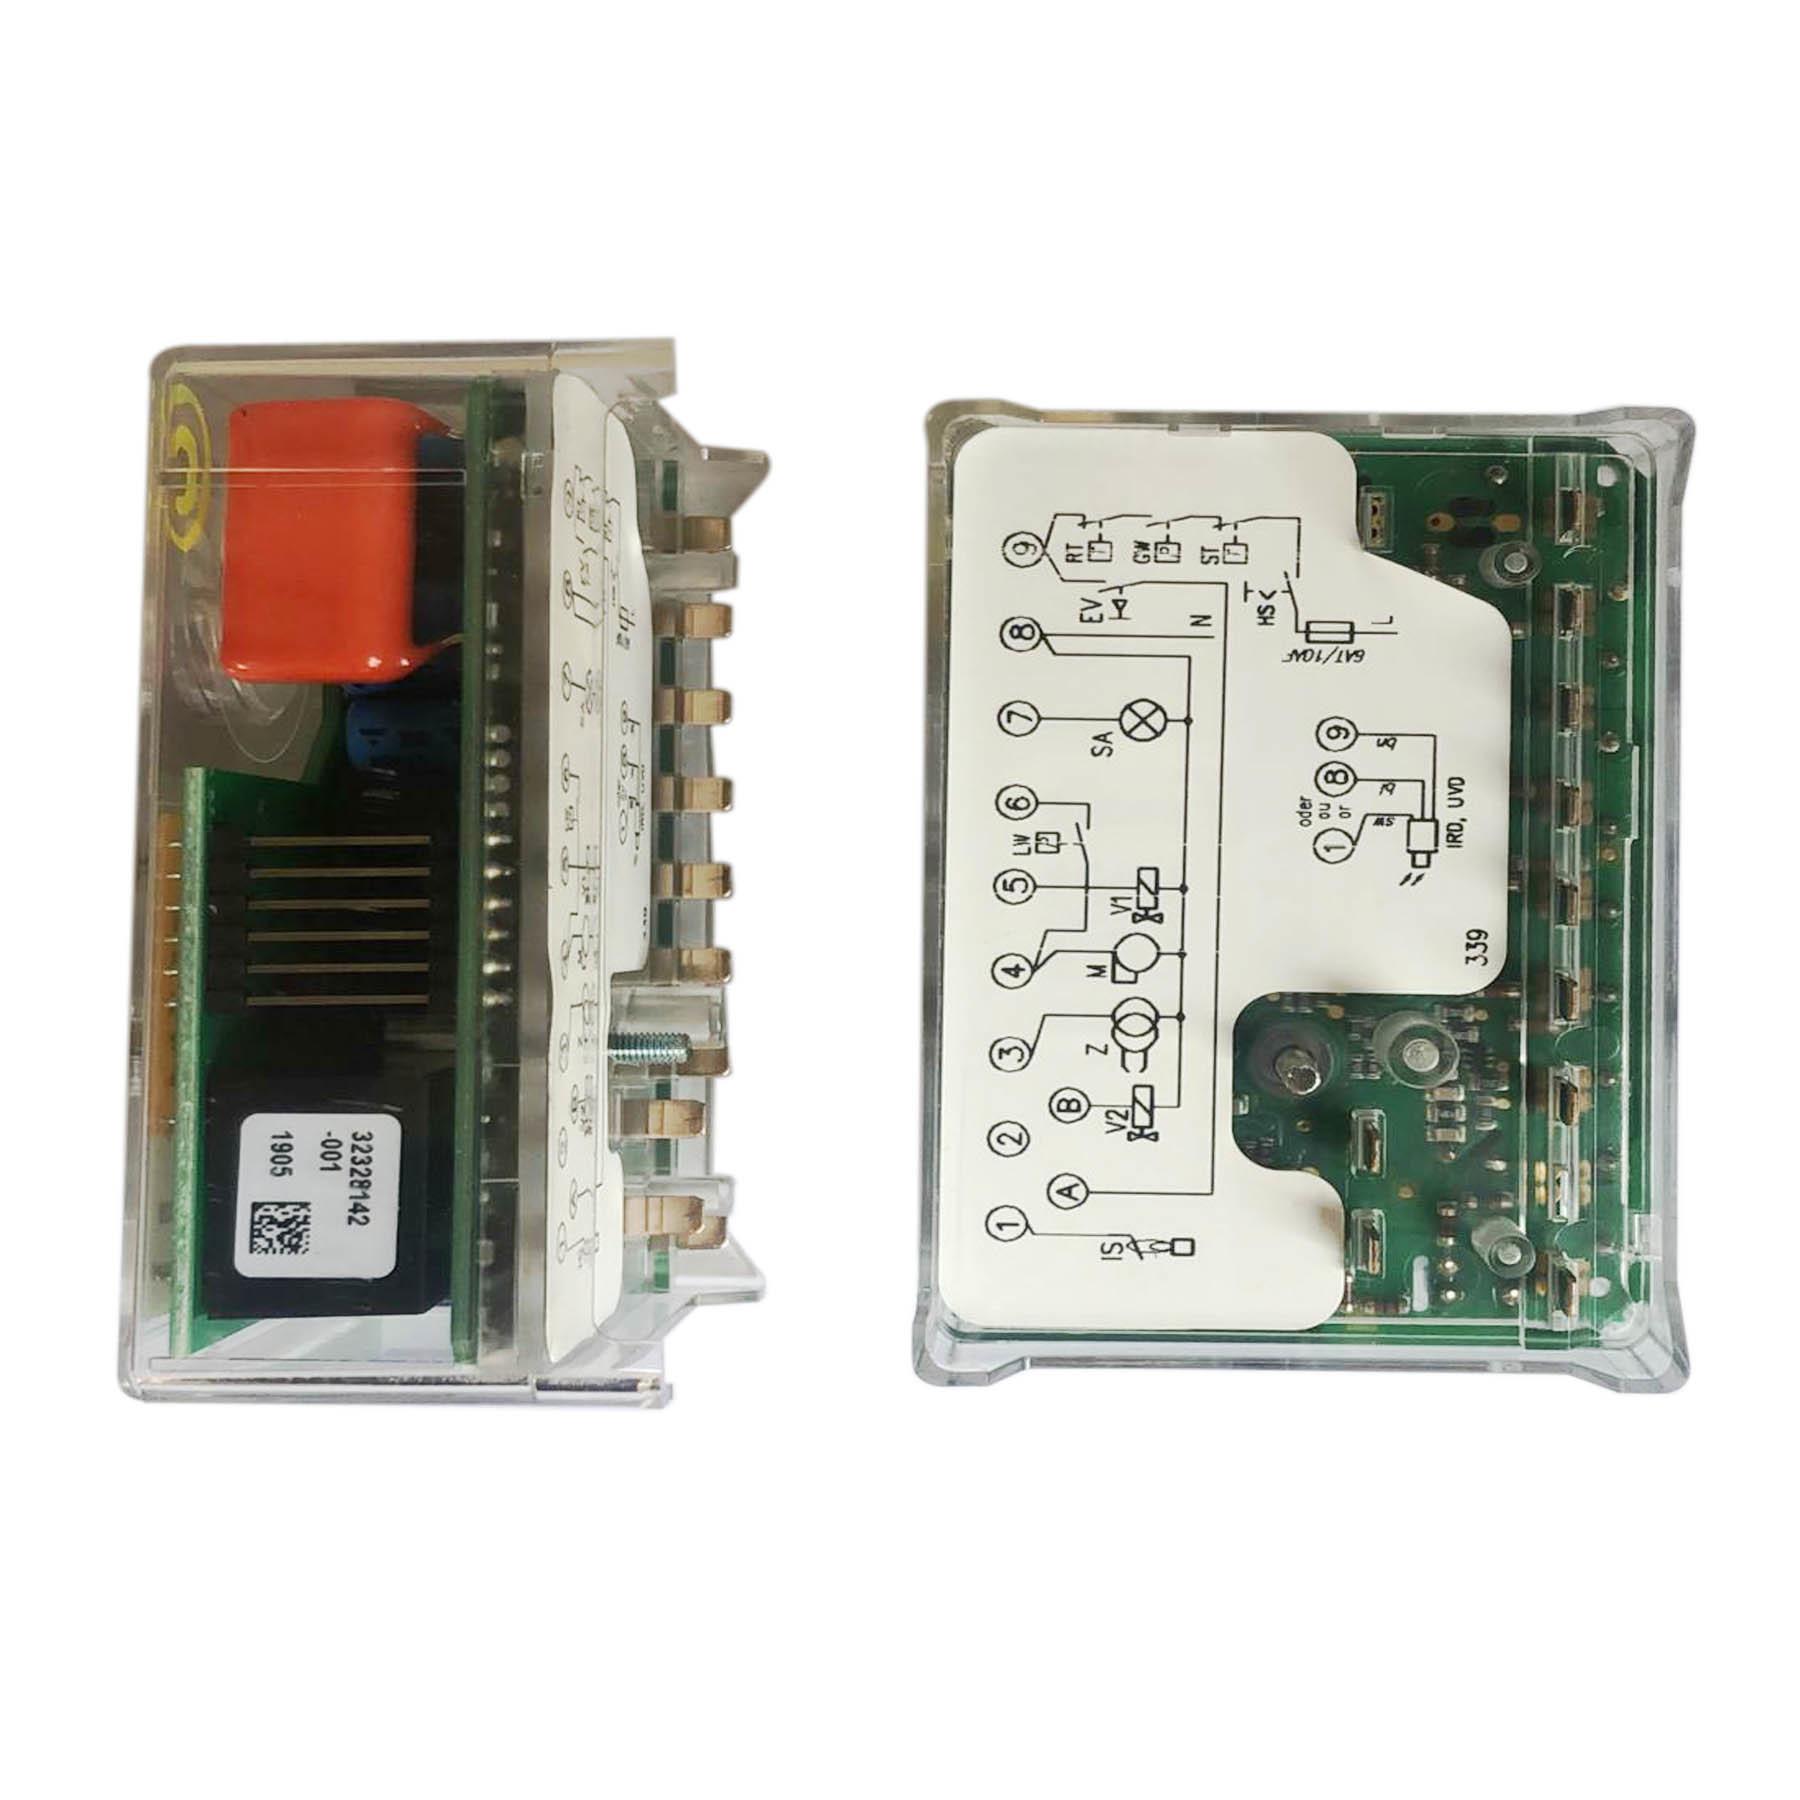 Honeywell Sequence Controller DLG 976